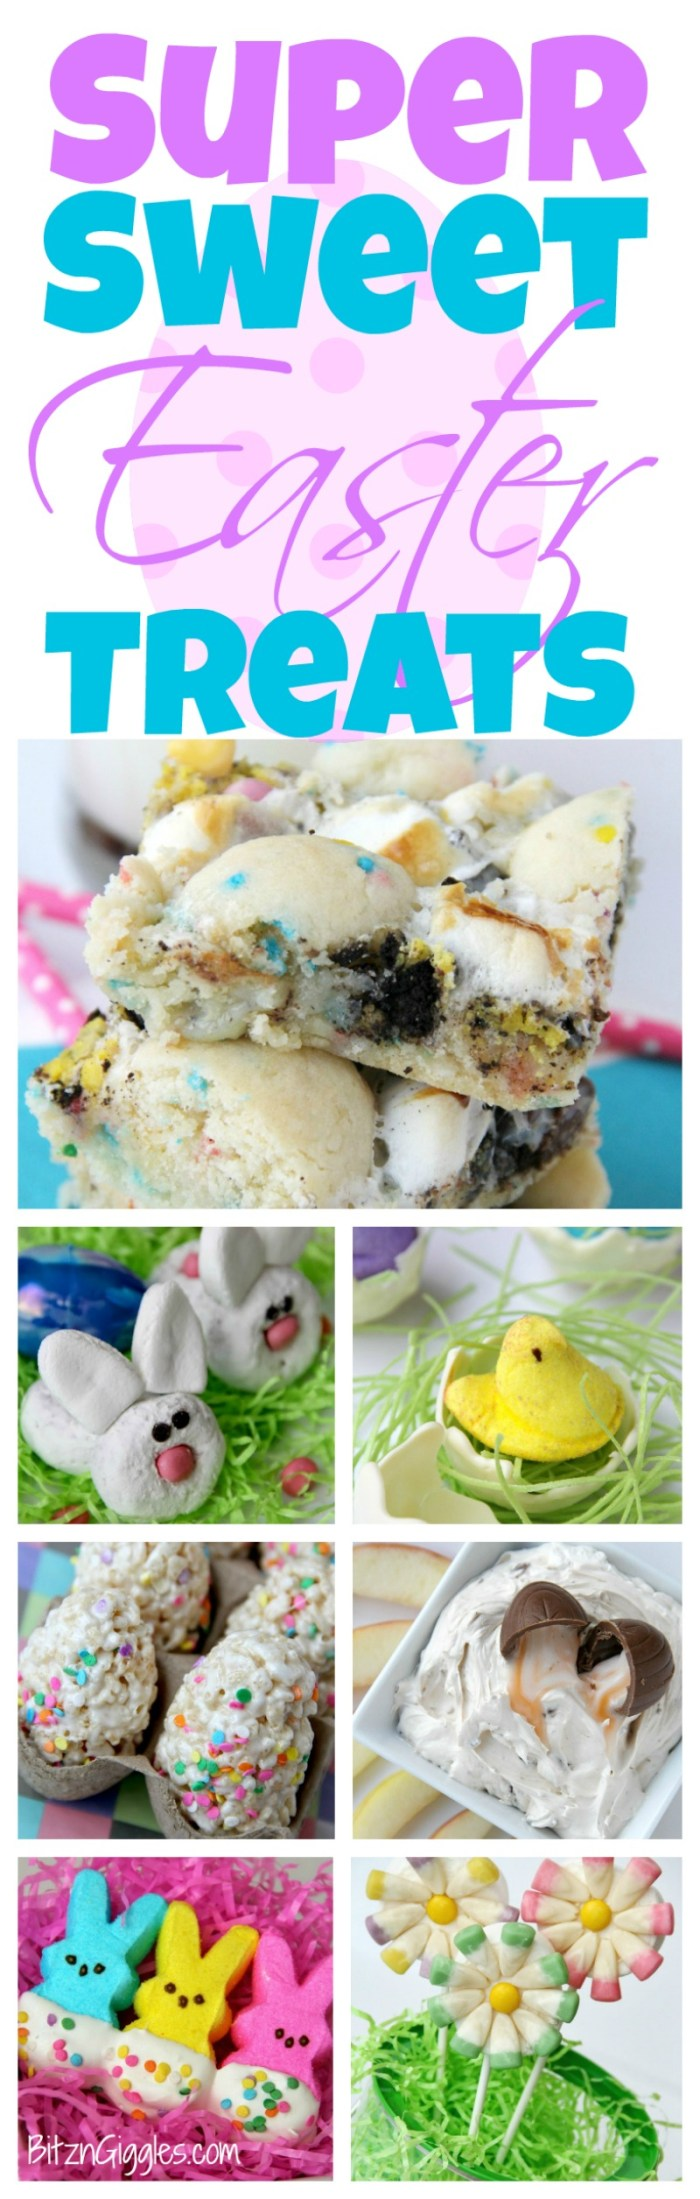 Super Sweet Easter Treats